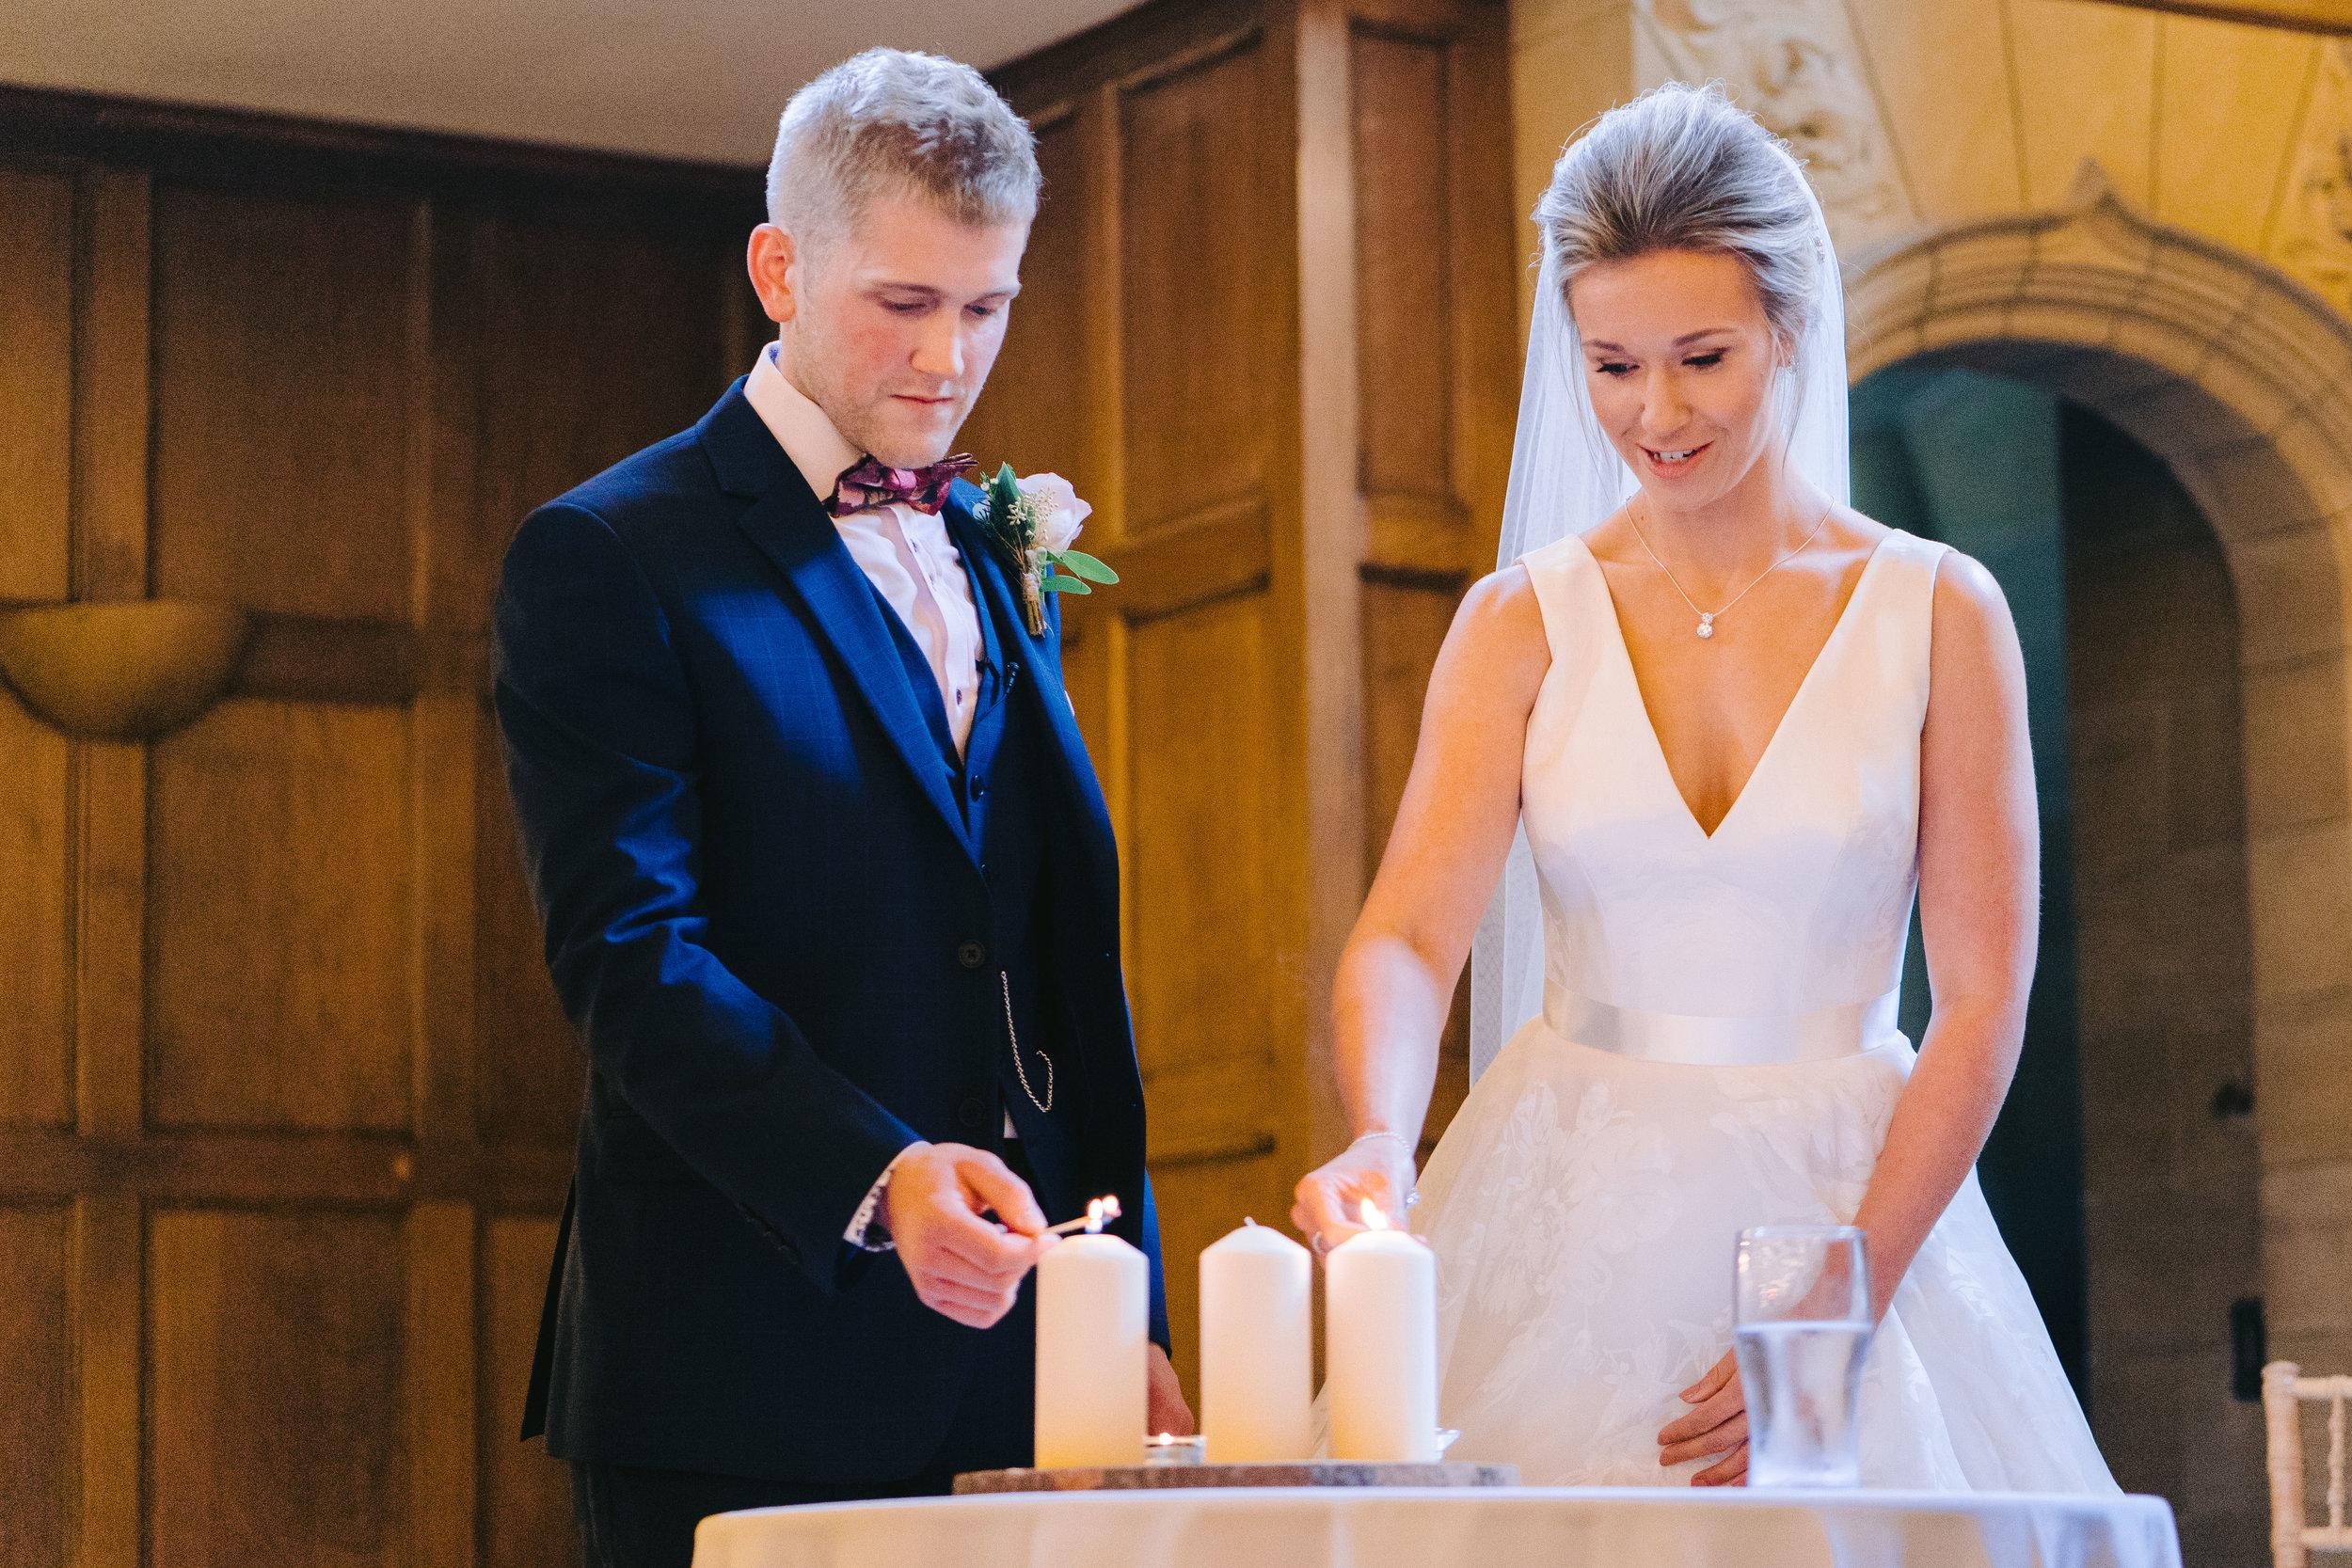 Karin_and_Shauns_Wedding_-_Achnagairn_Castle_-_www.eilidhrobertson.co.uk-518.jpg